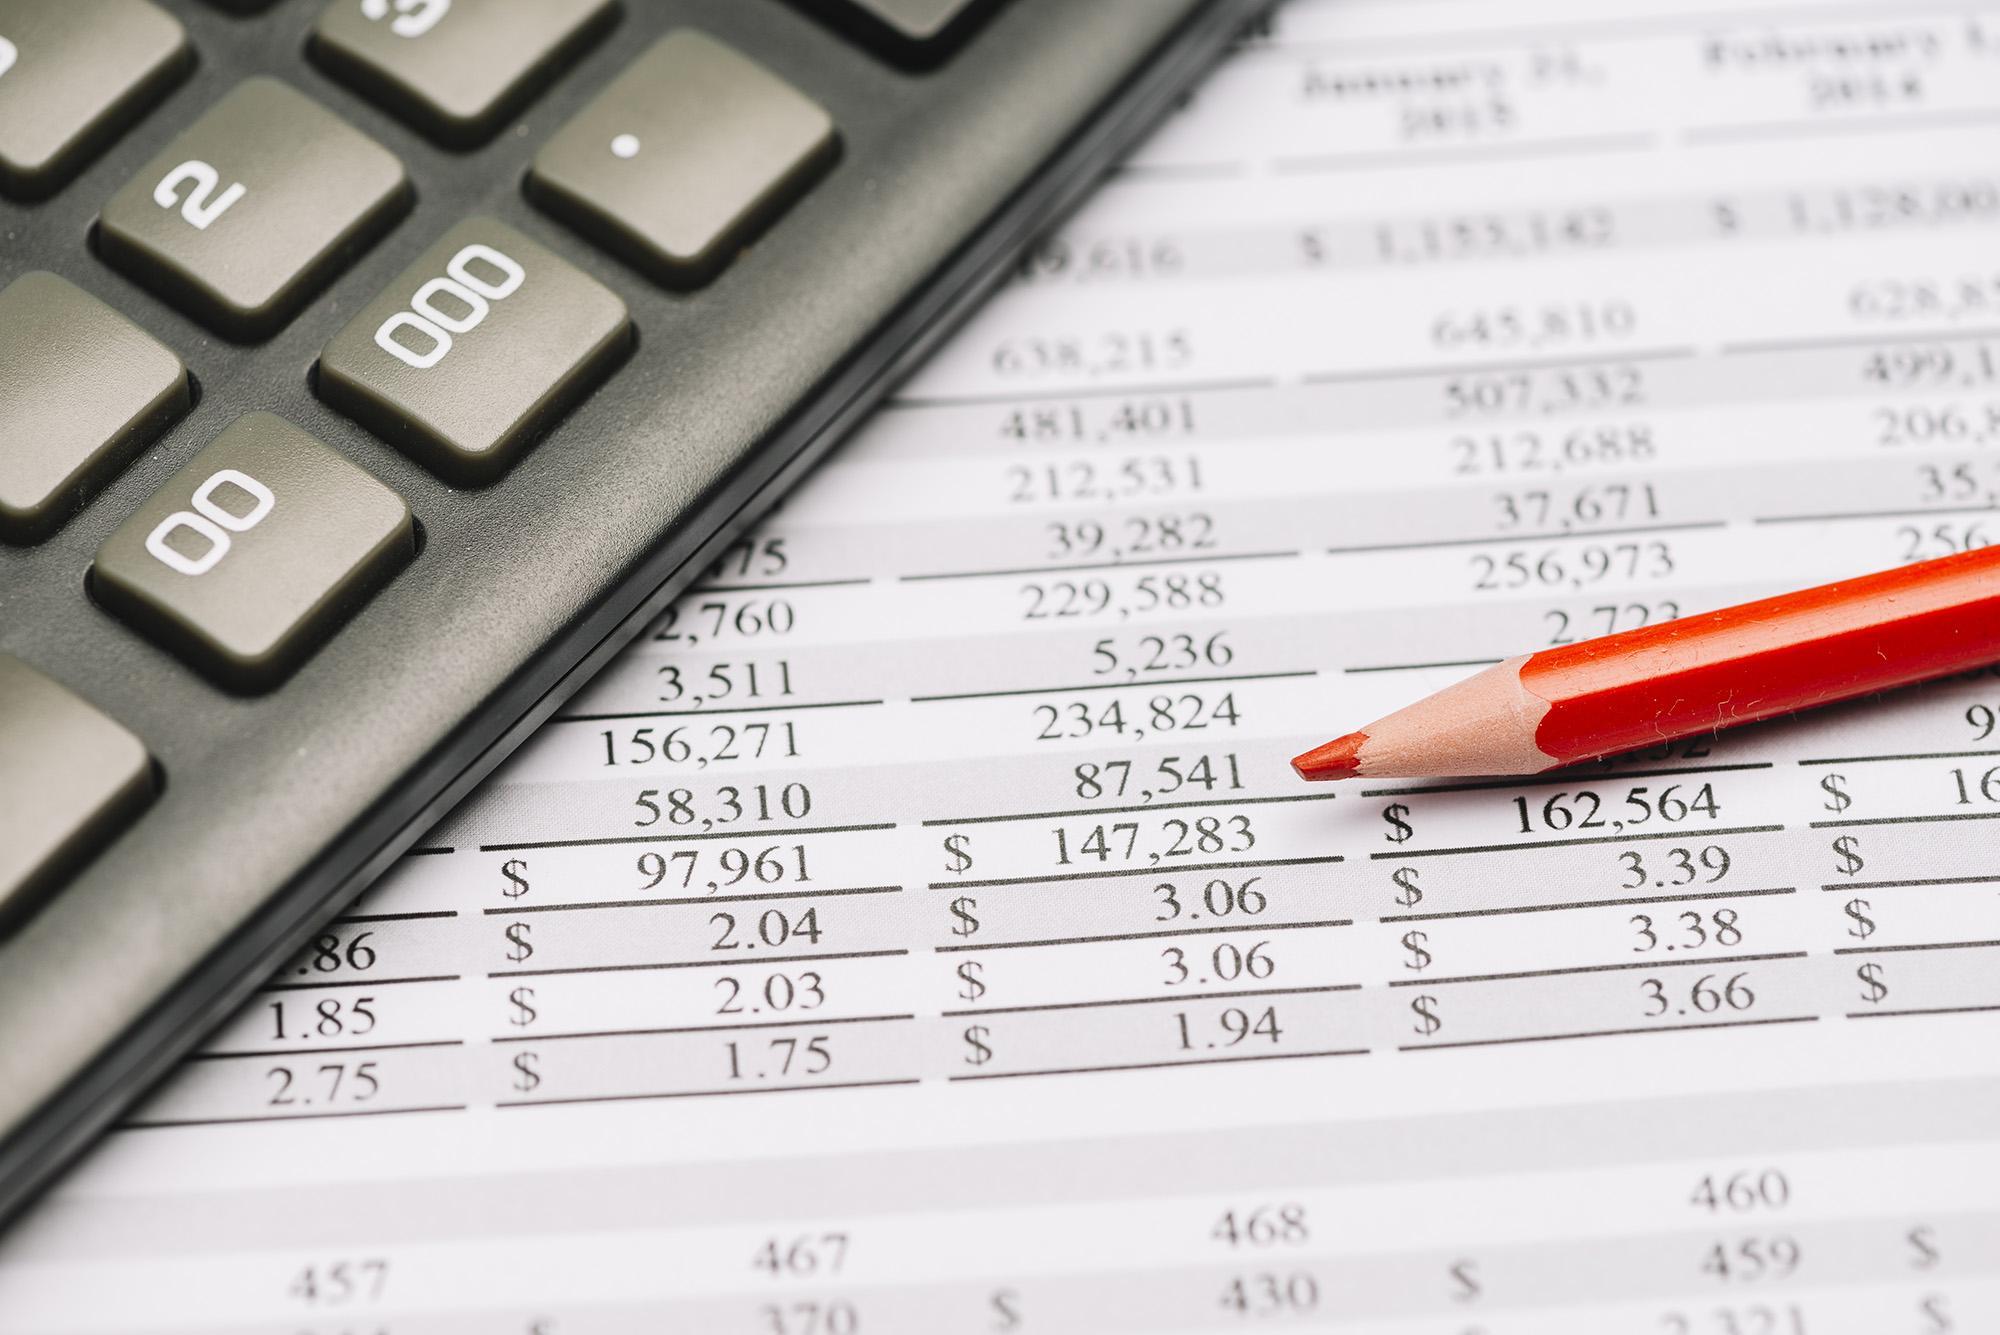 Foto mostra tabela com cálculos e calculadora.